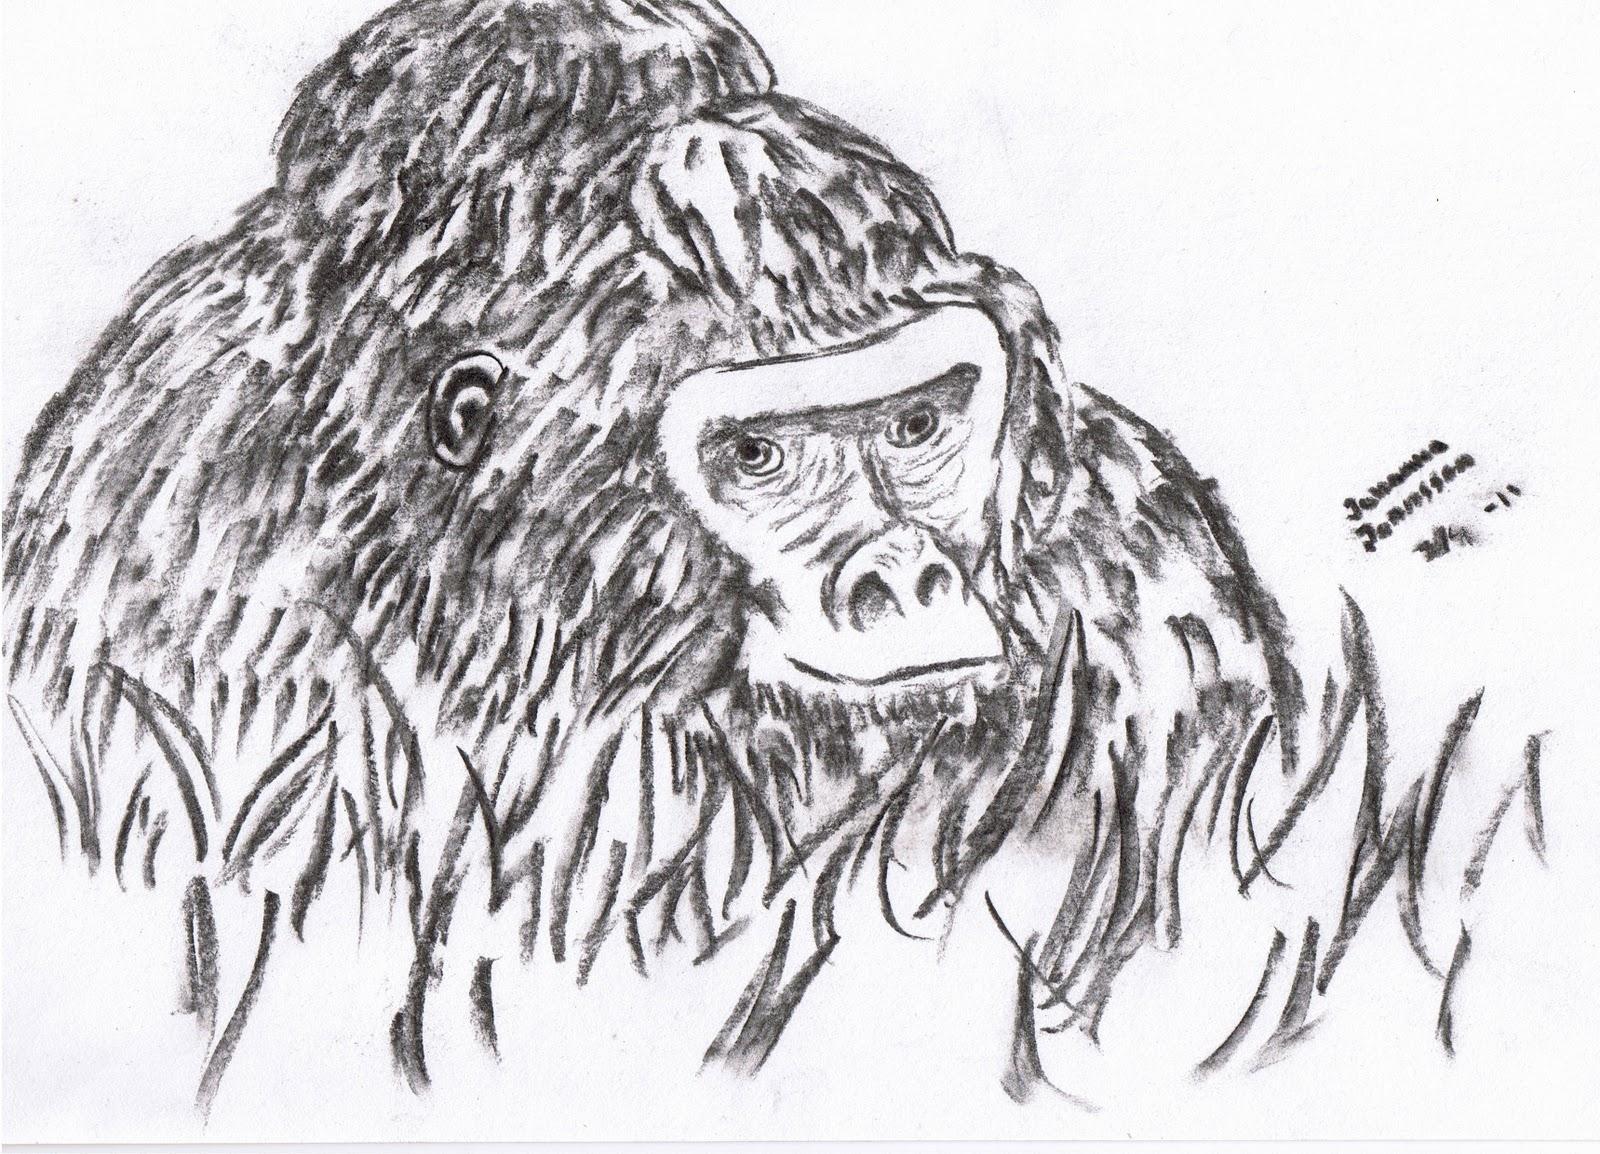 min klasskompis är en apa